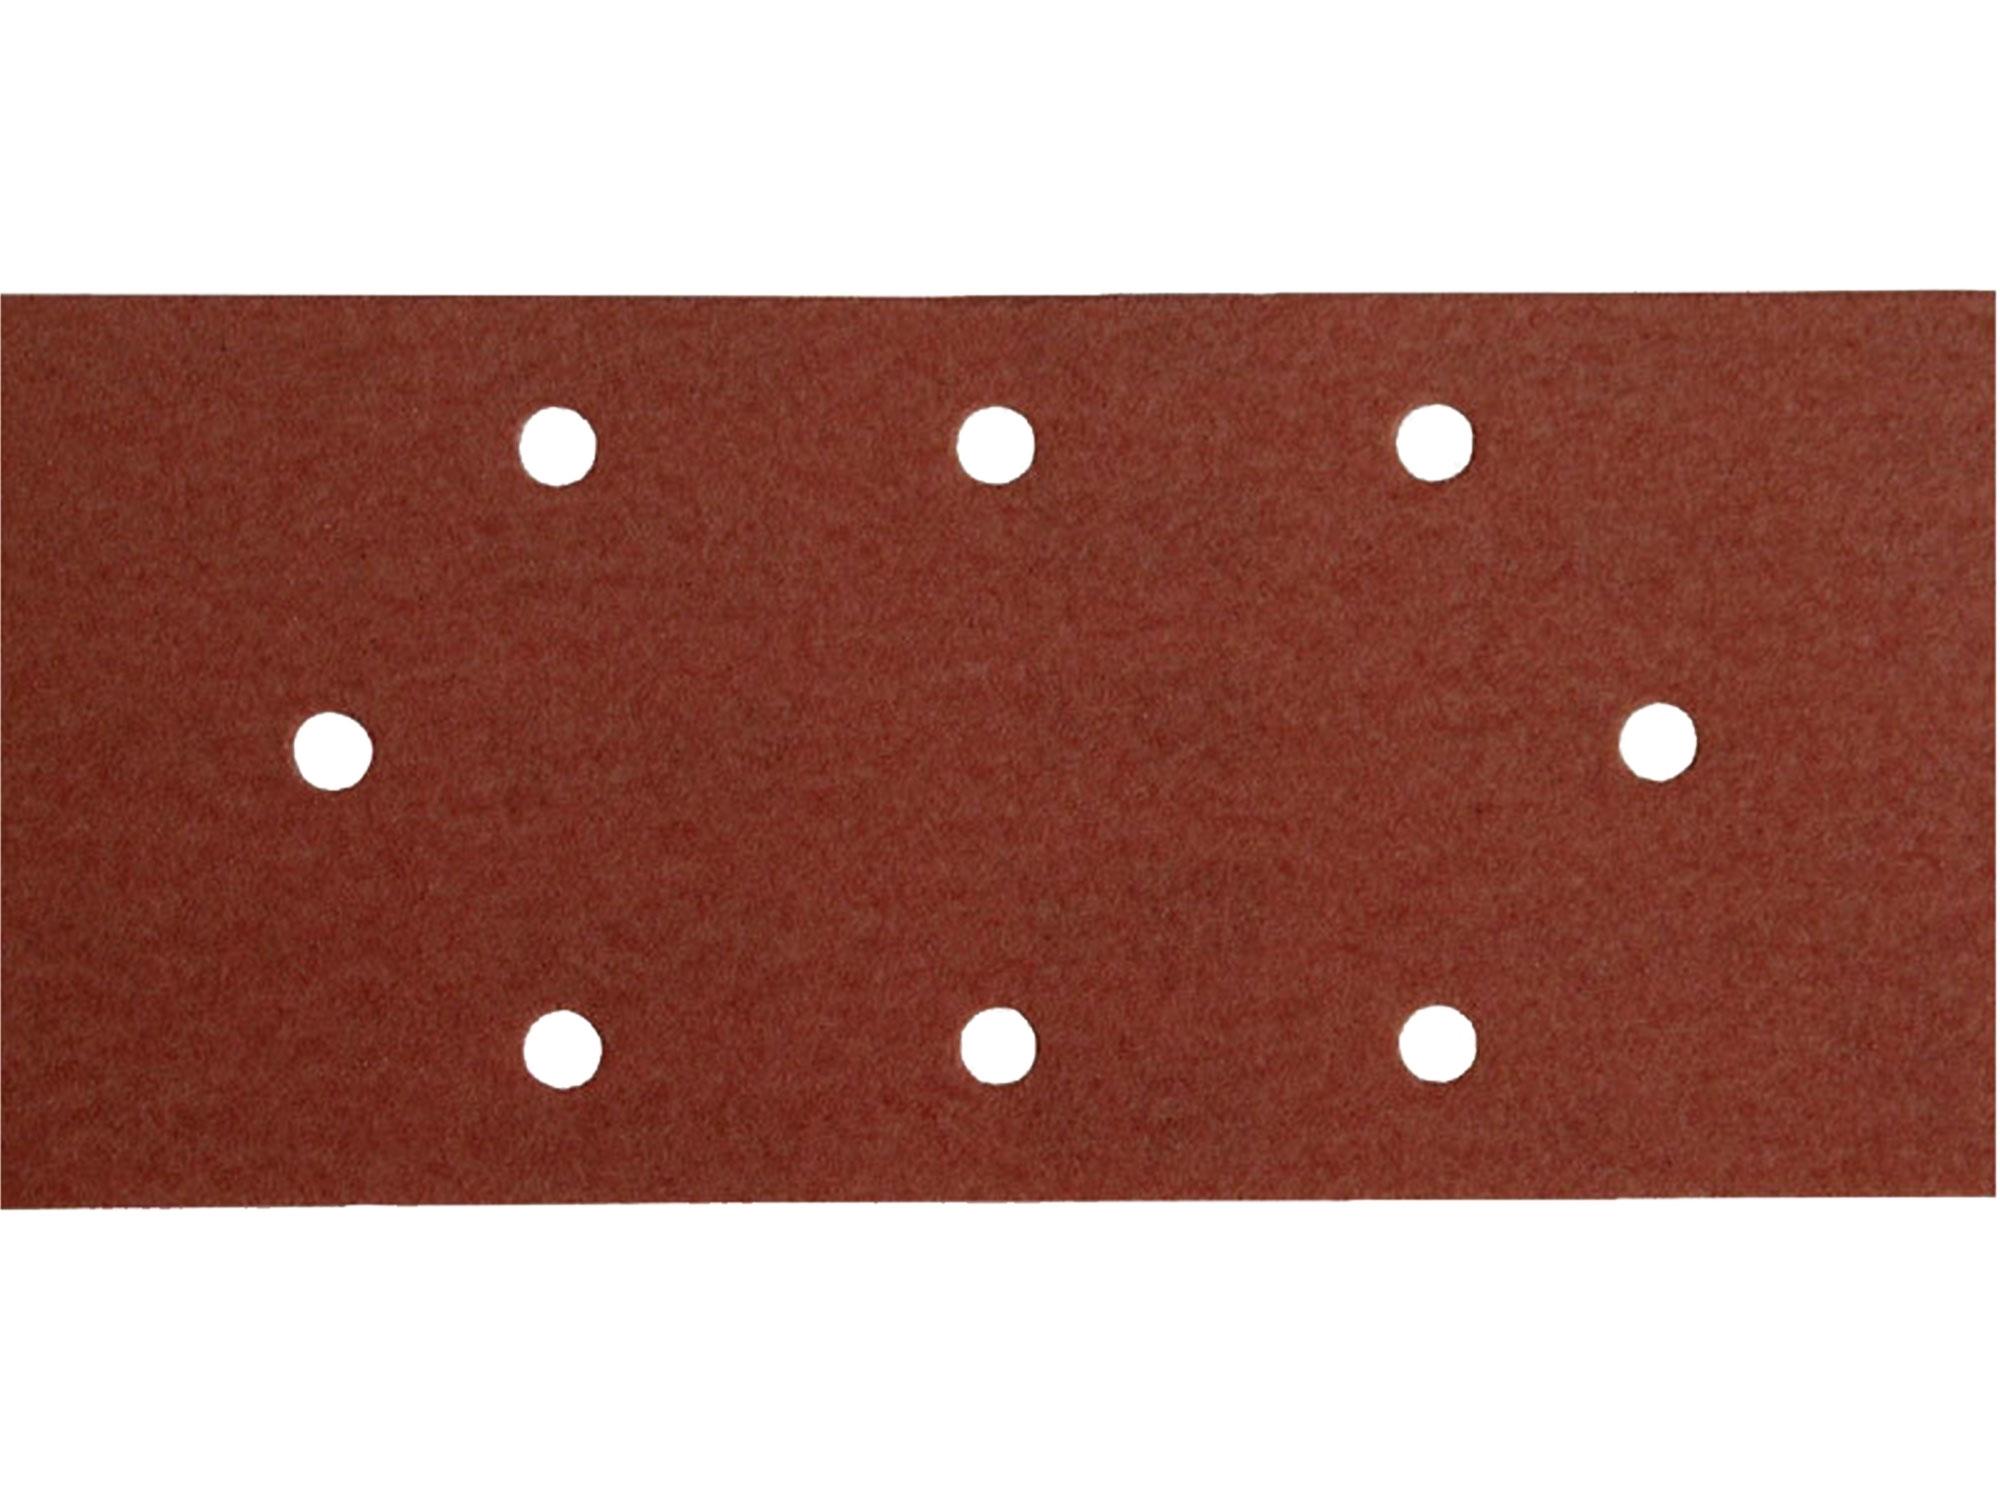 papíry brusné, suchý zip, bal. 10ks, 93x190mm, P60